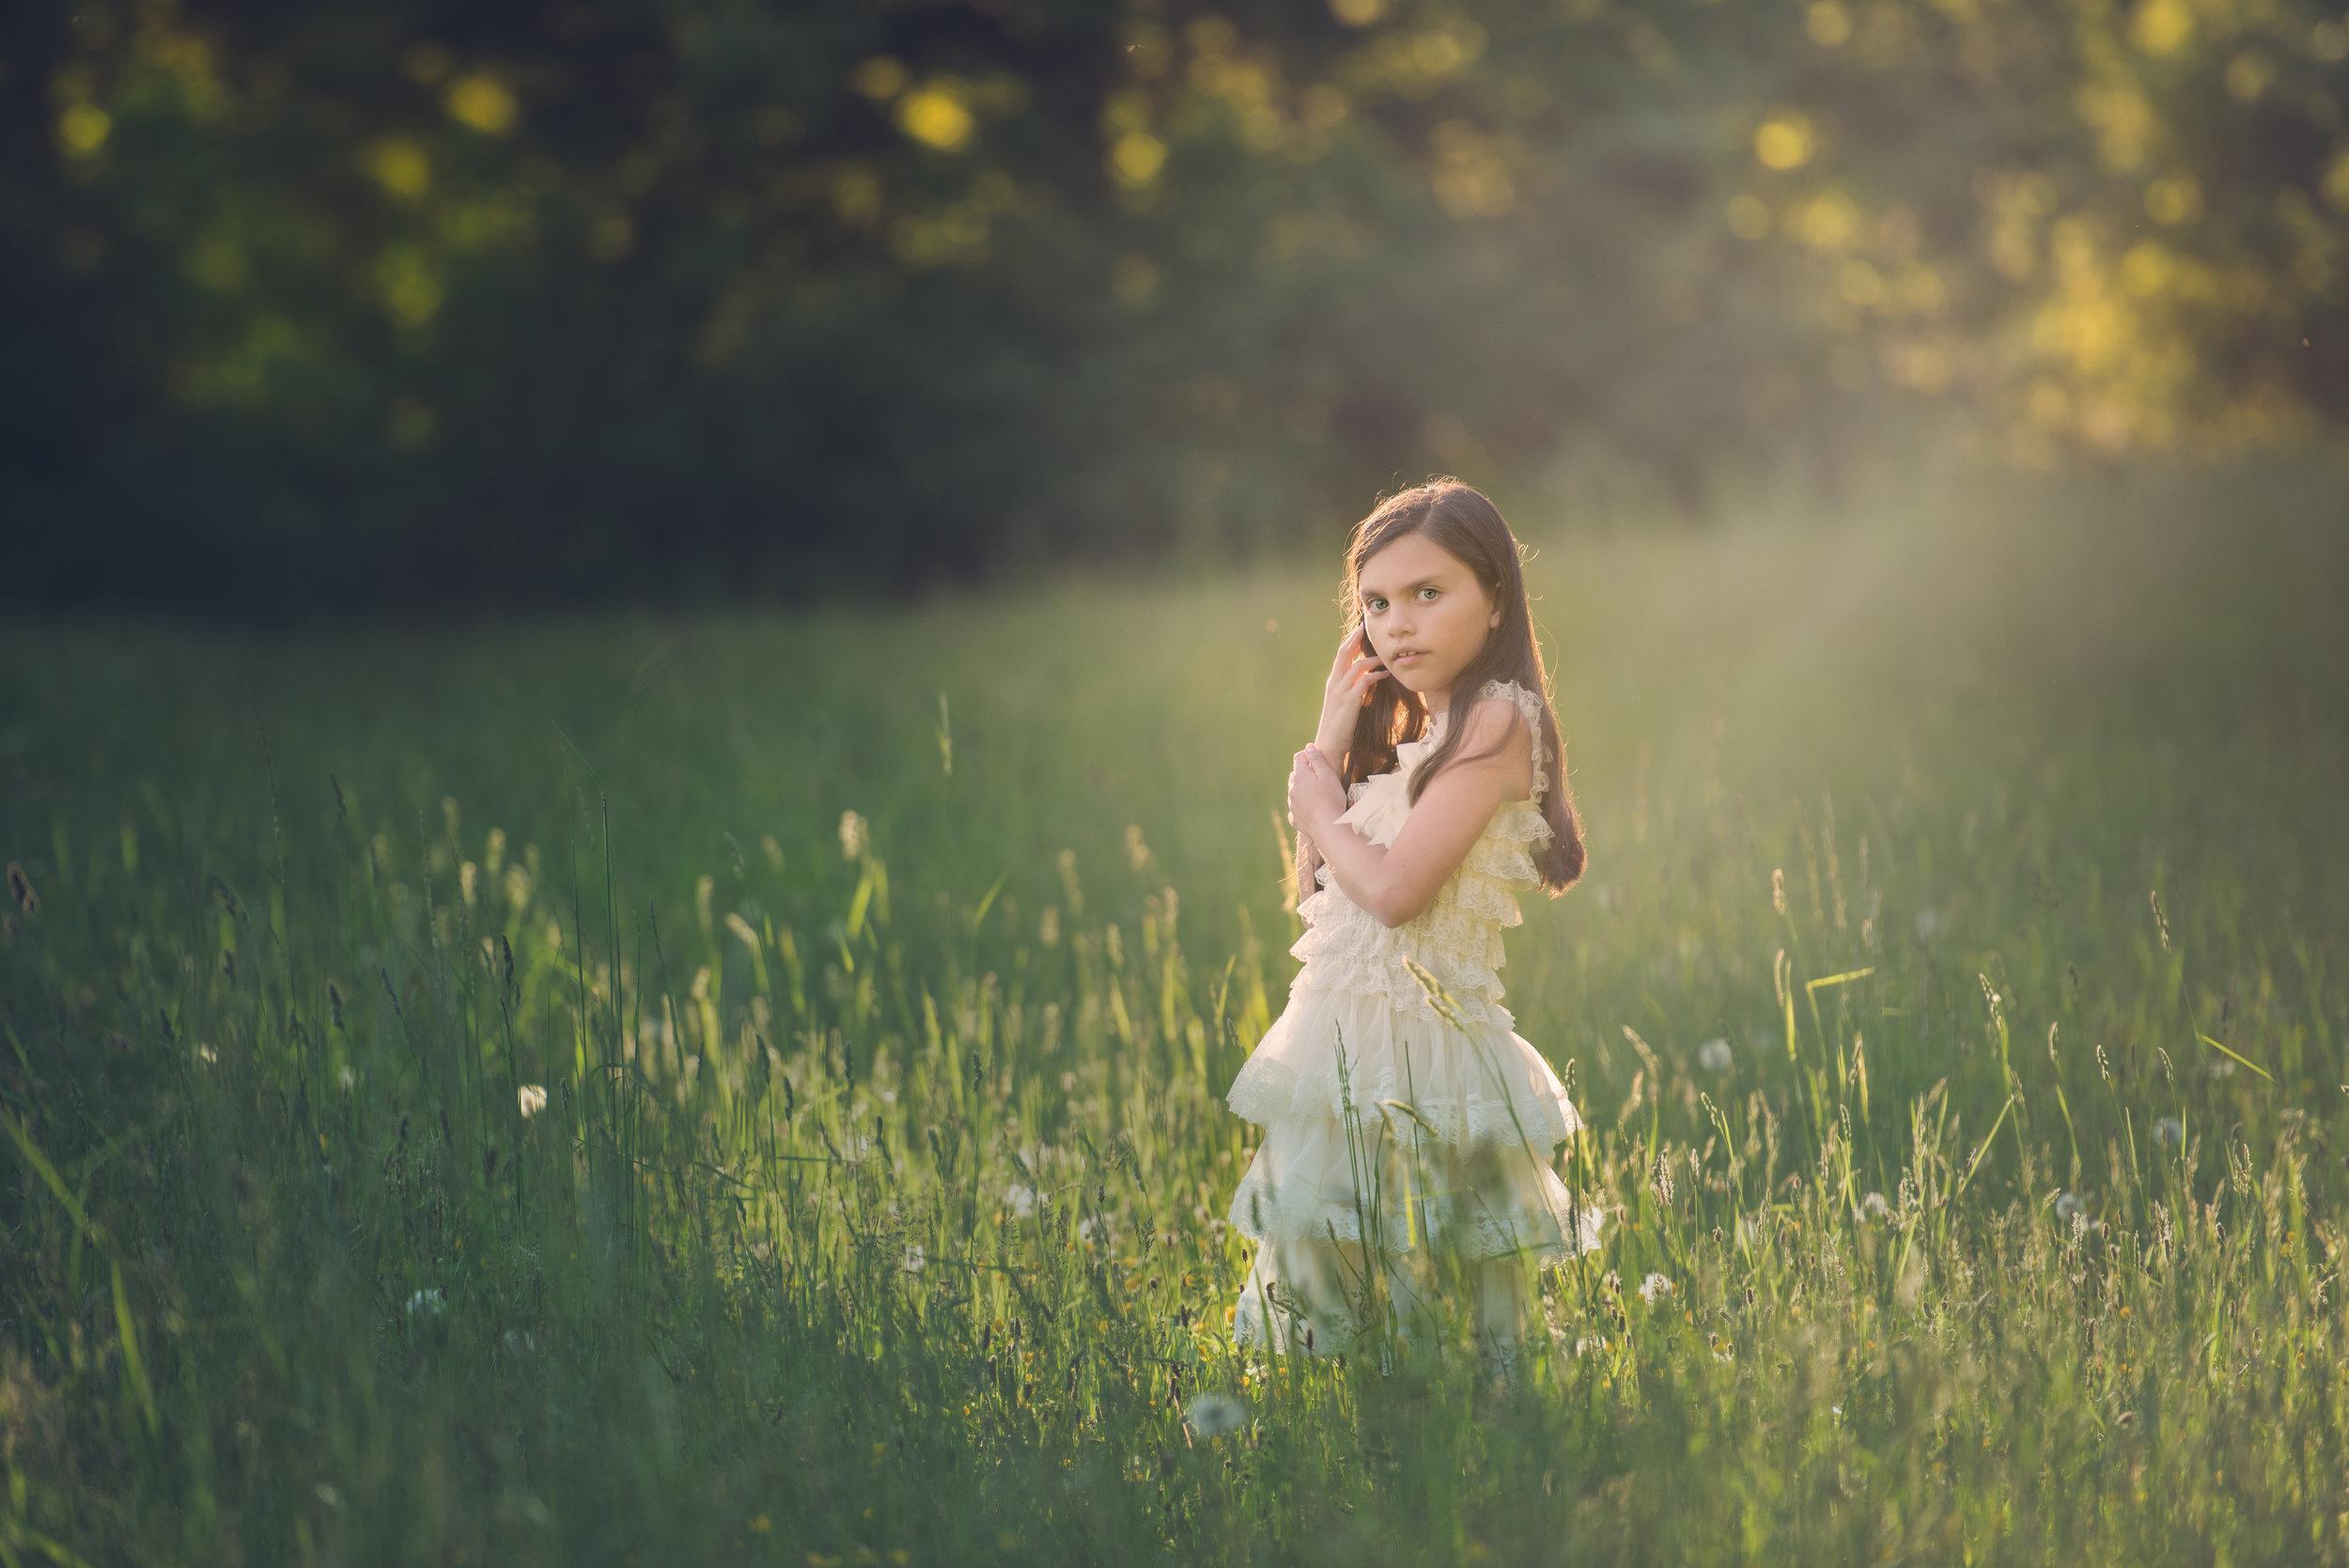 Girl in Dress in Spring Field NRT Sheep Pasture